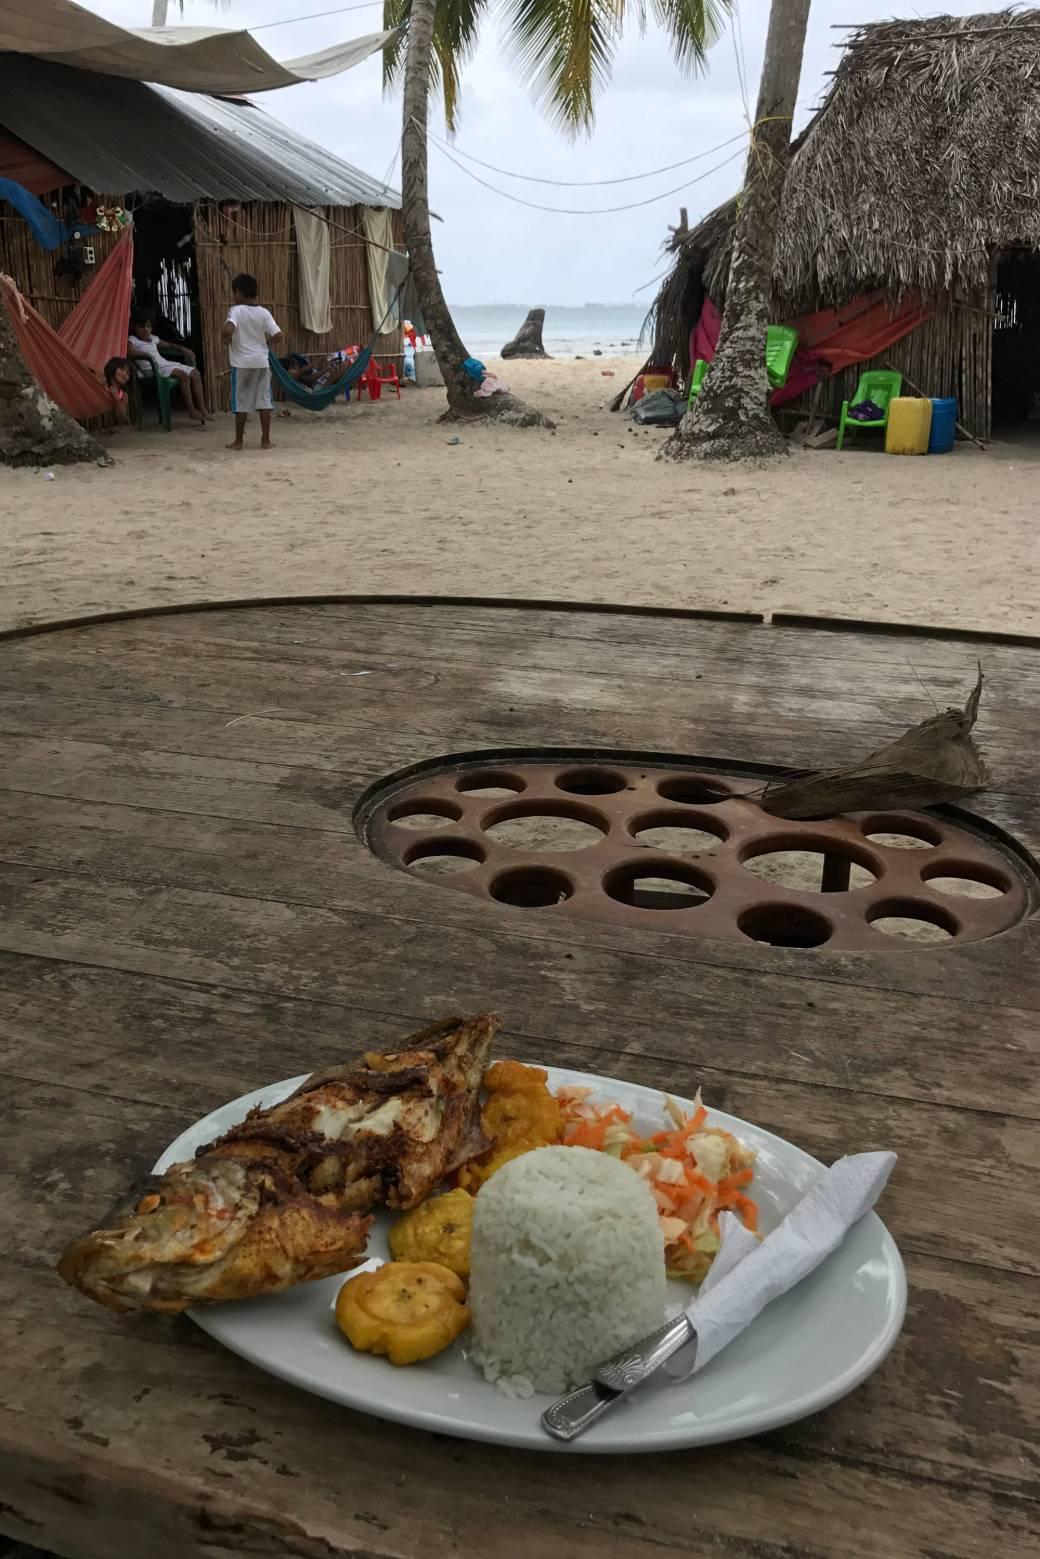 Pescado frito como almuerzo en isla Chichime, Guna Yala o San Blas, Panamá